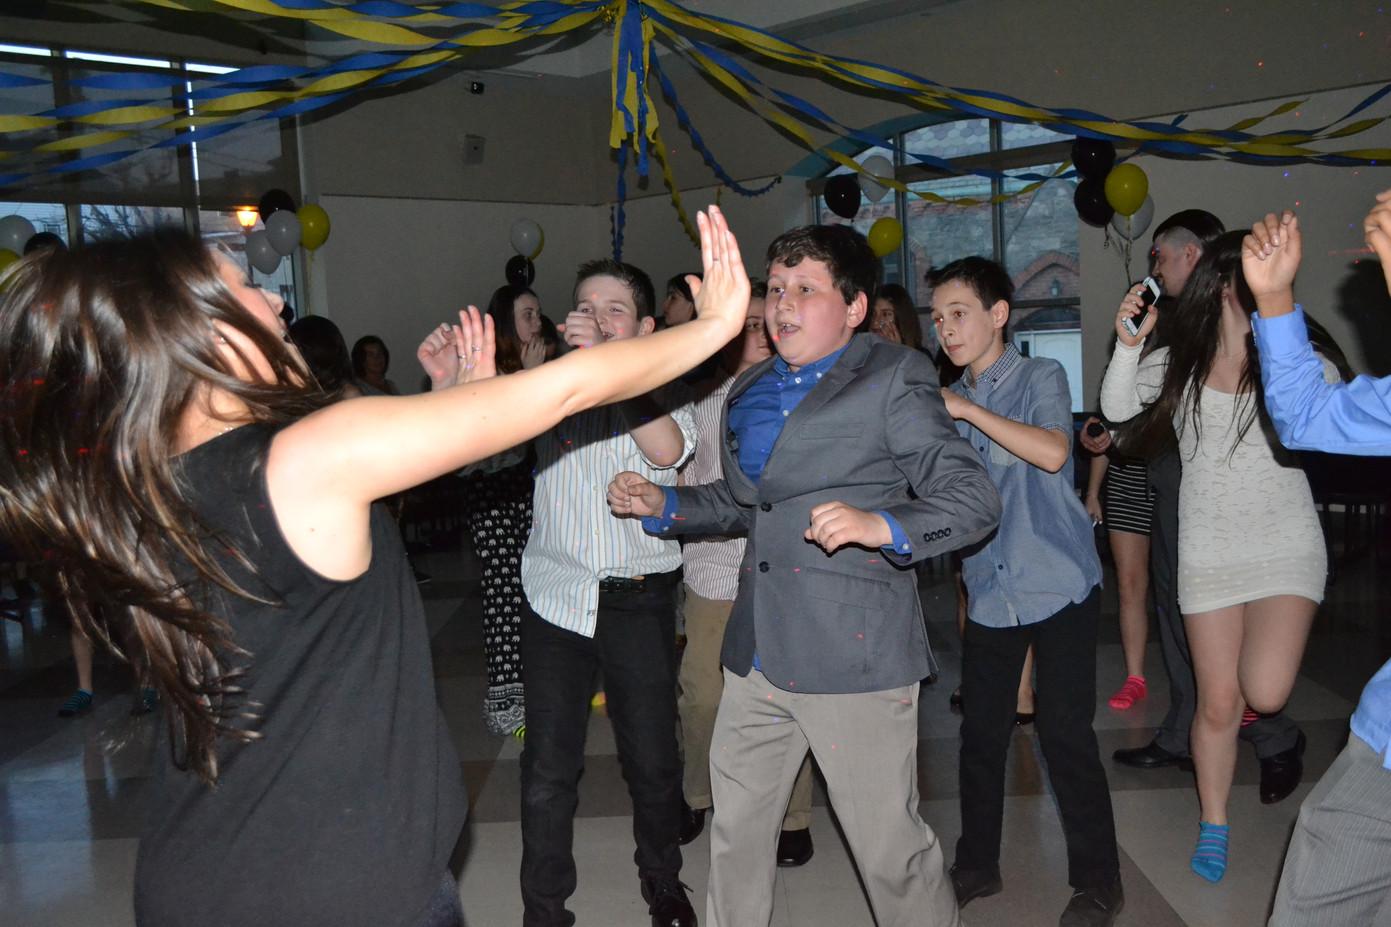 Teens-Dance-Party.JPG